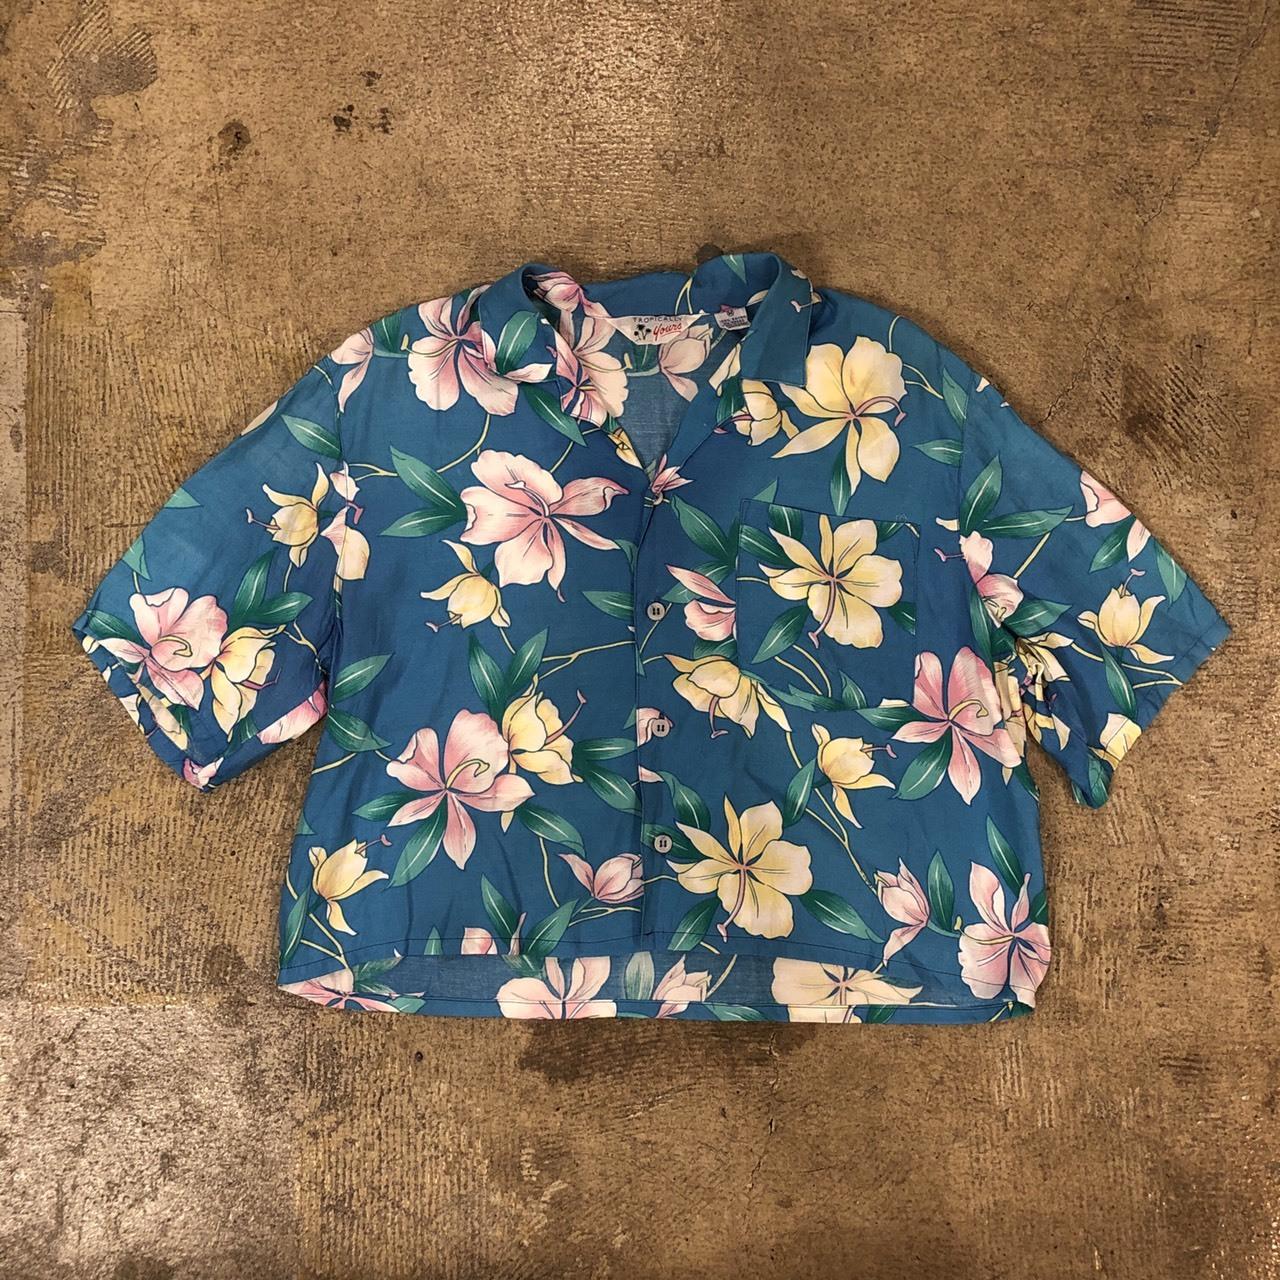 Remake Aloha Shirt No.2